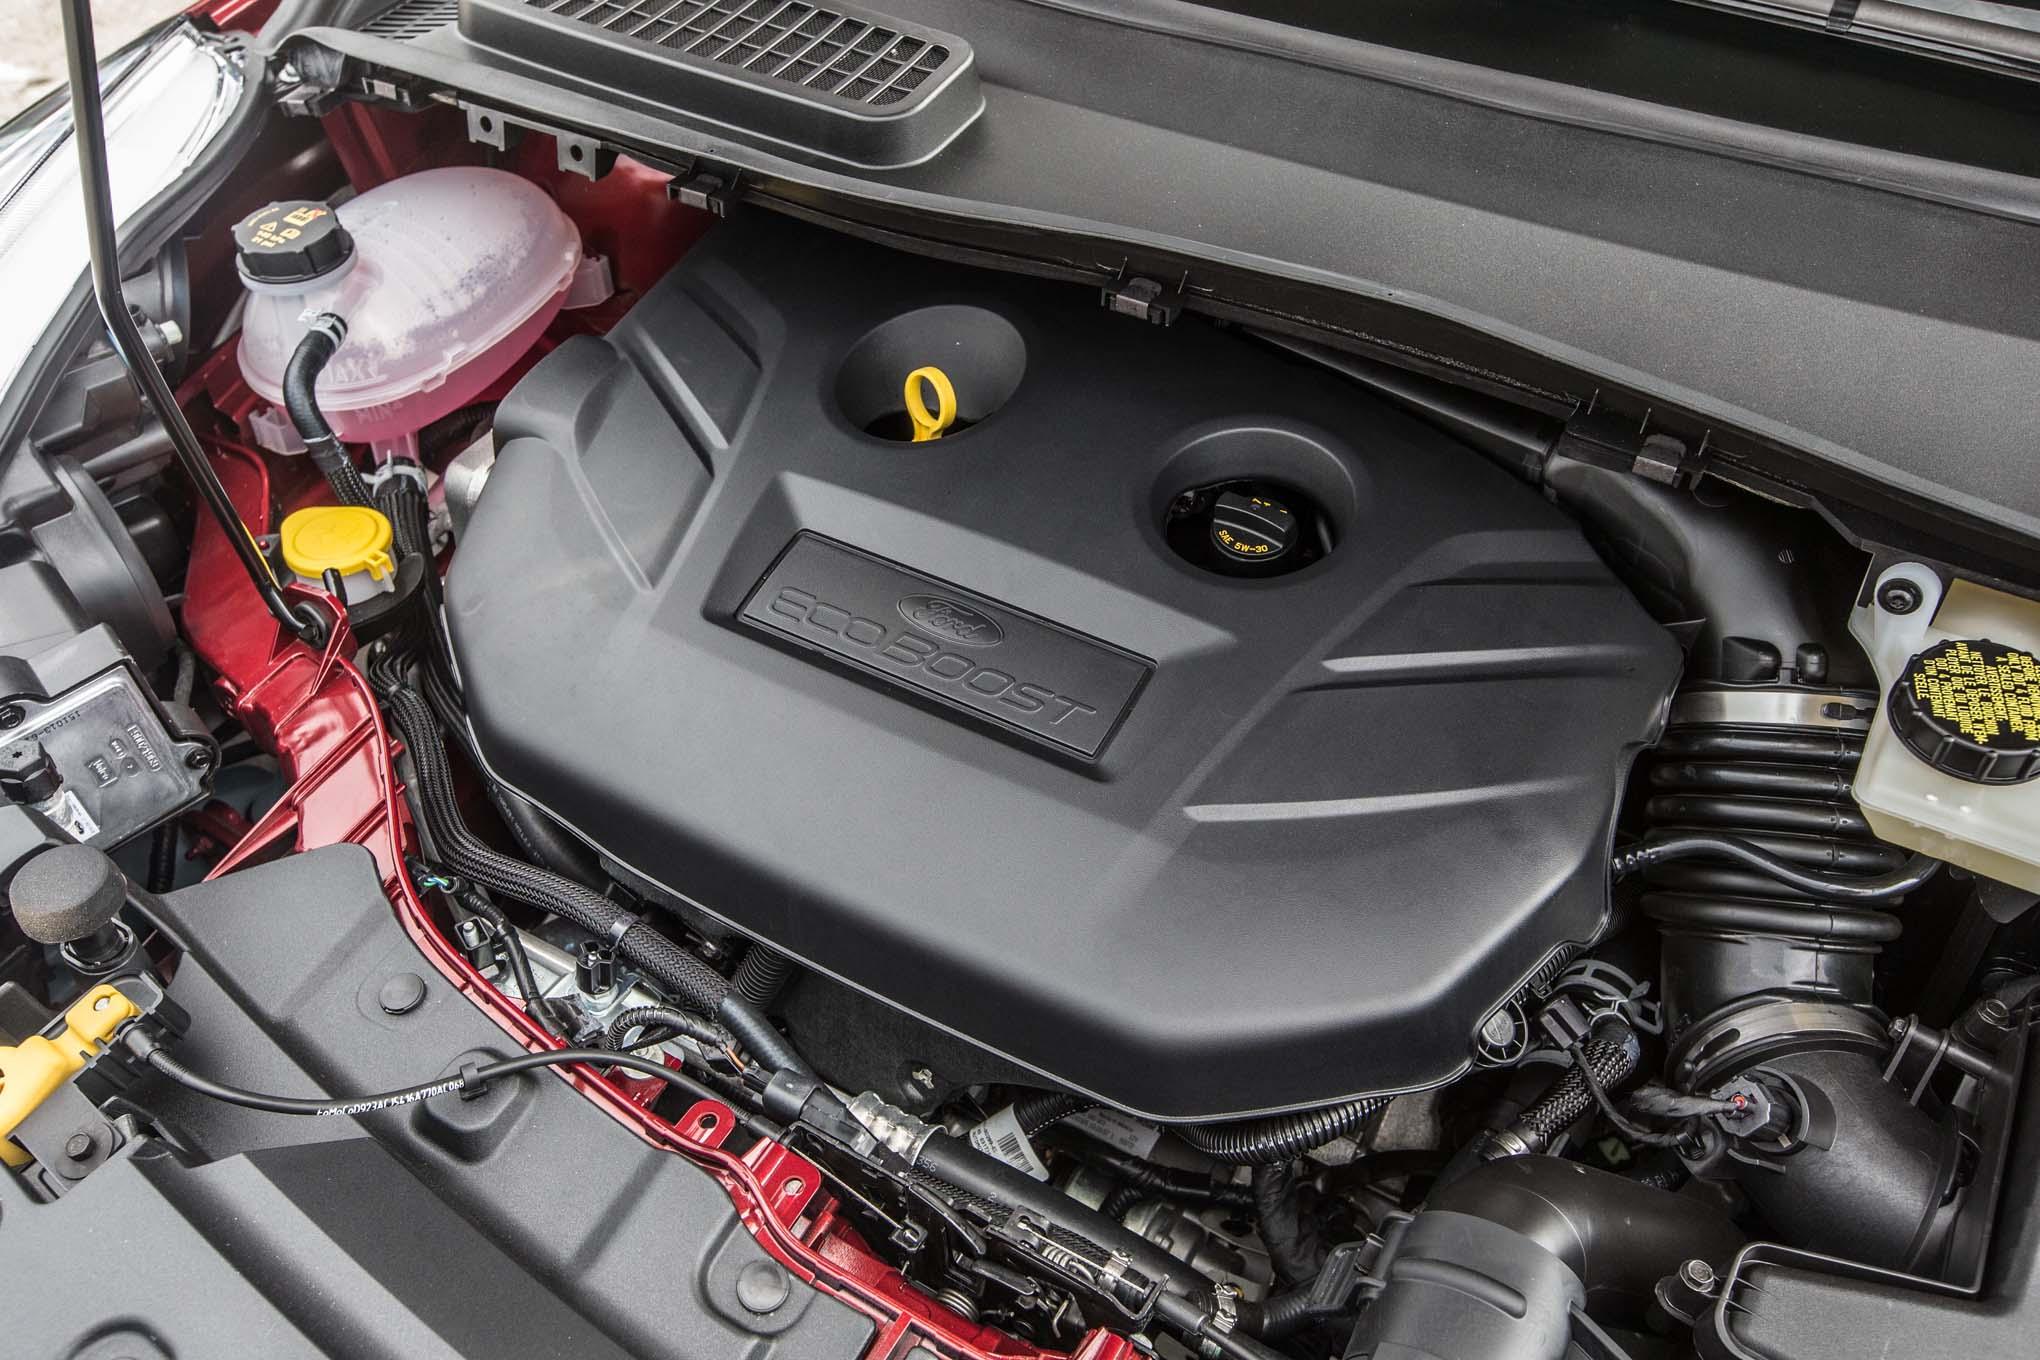 2017 Ford Escape Anium 20 Ecoboost Engine 112